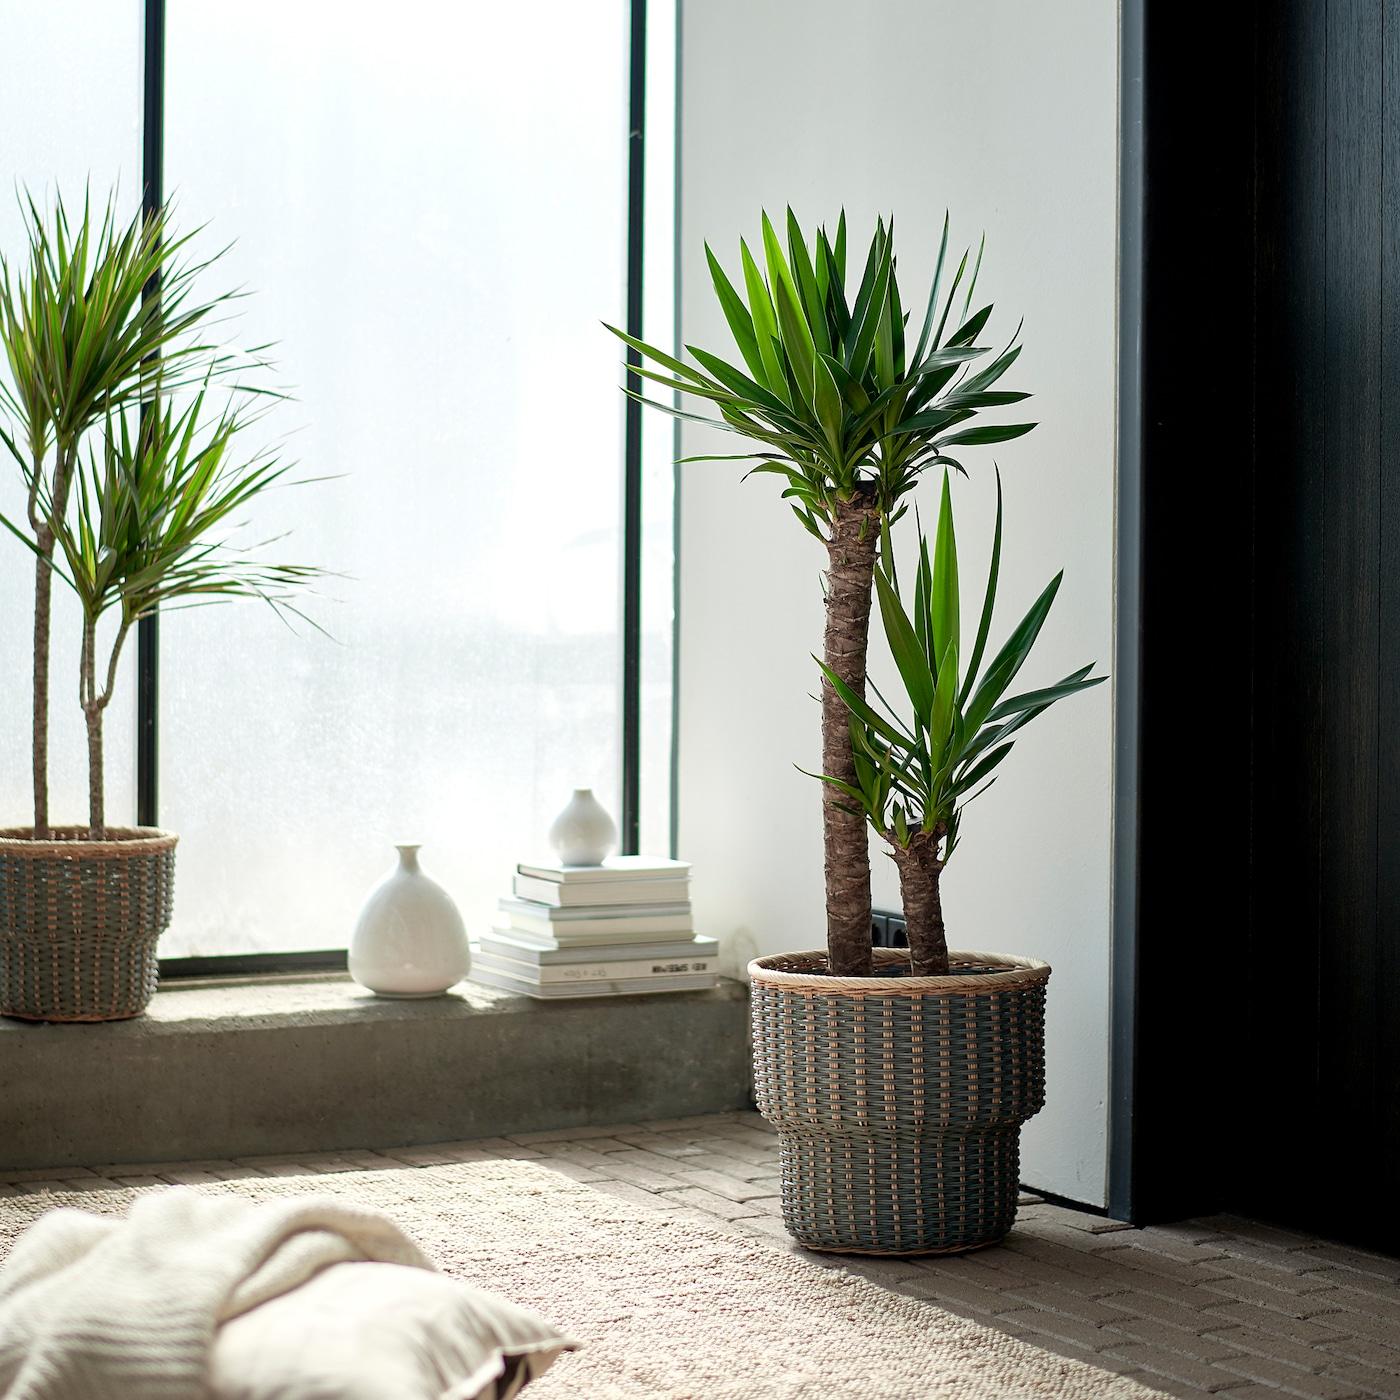 Piante Da Interno Yucca.Yucca Elephantipes Pianta Da Vaso 2 Steli Ikea